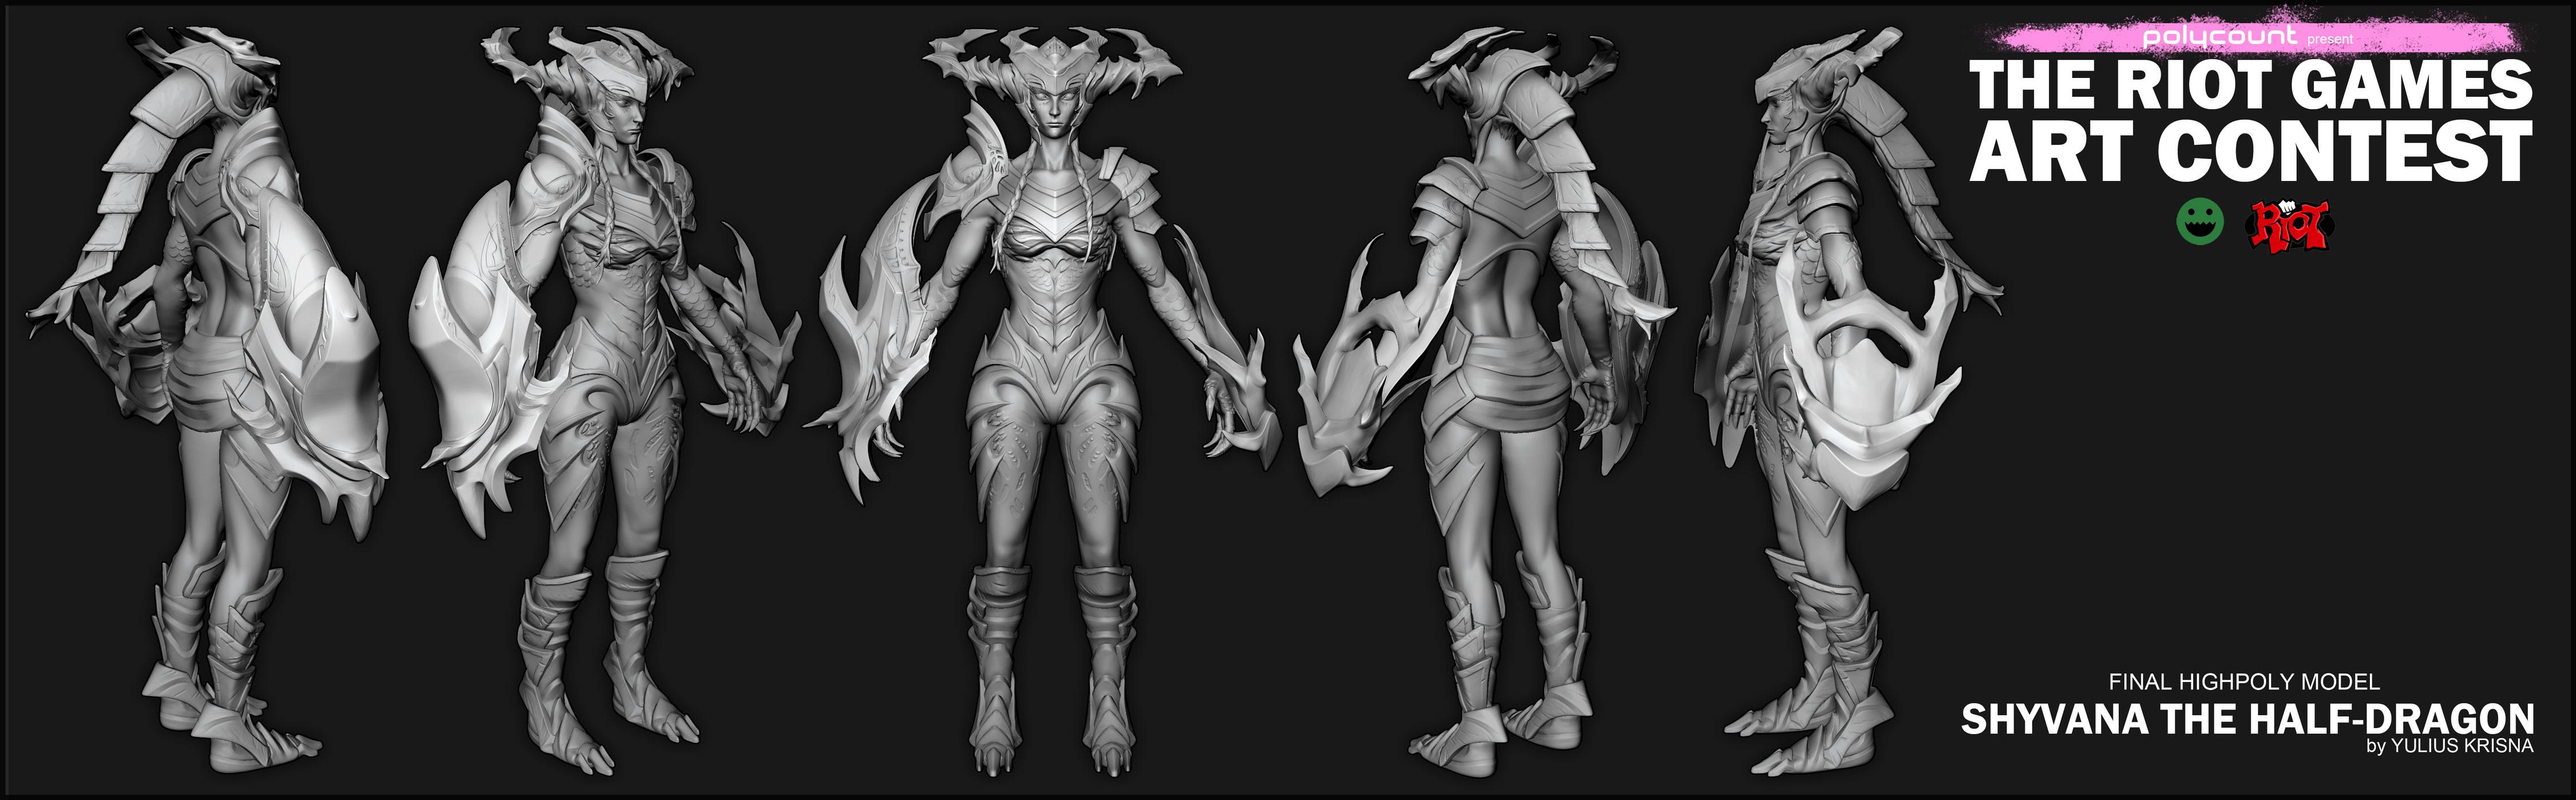 _final_hp_shyvana_the_half_dragon_by_yuliuskrisna-d877nje.jpg